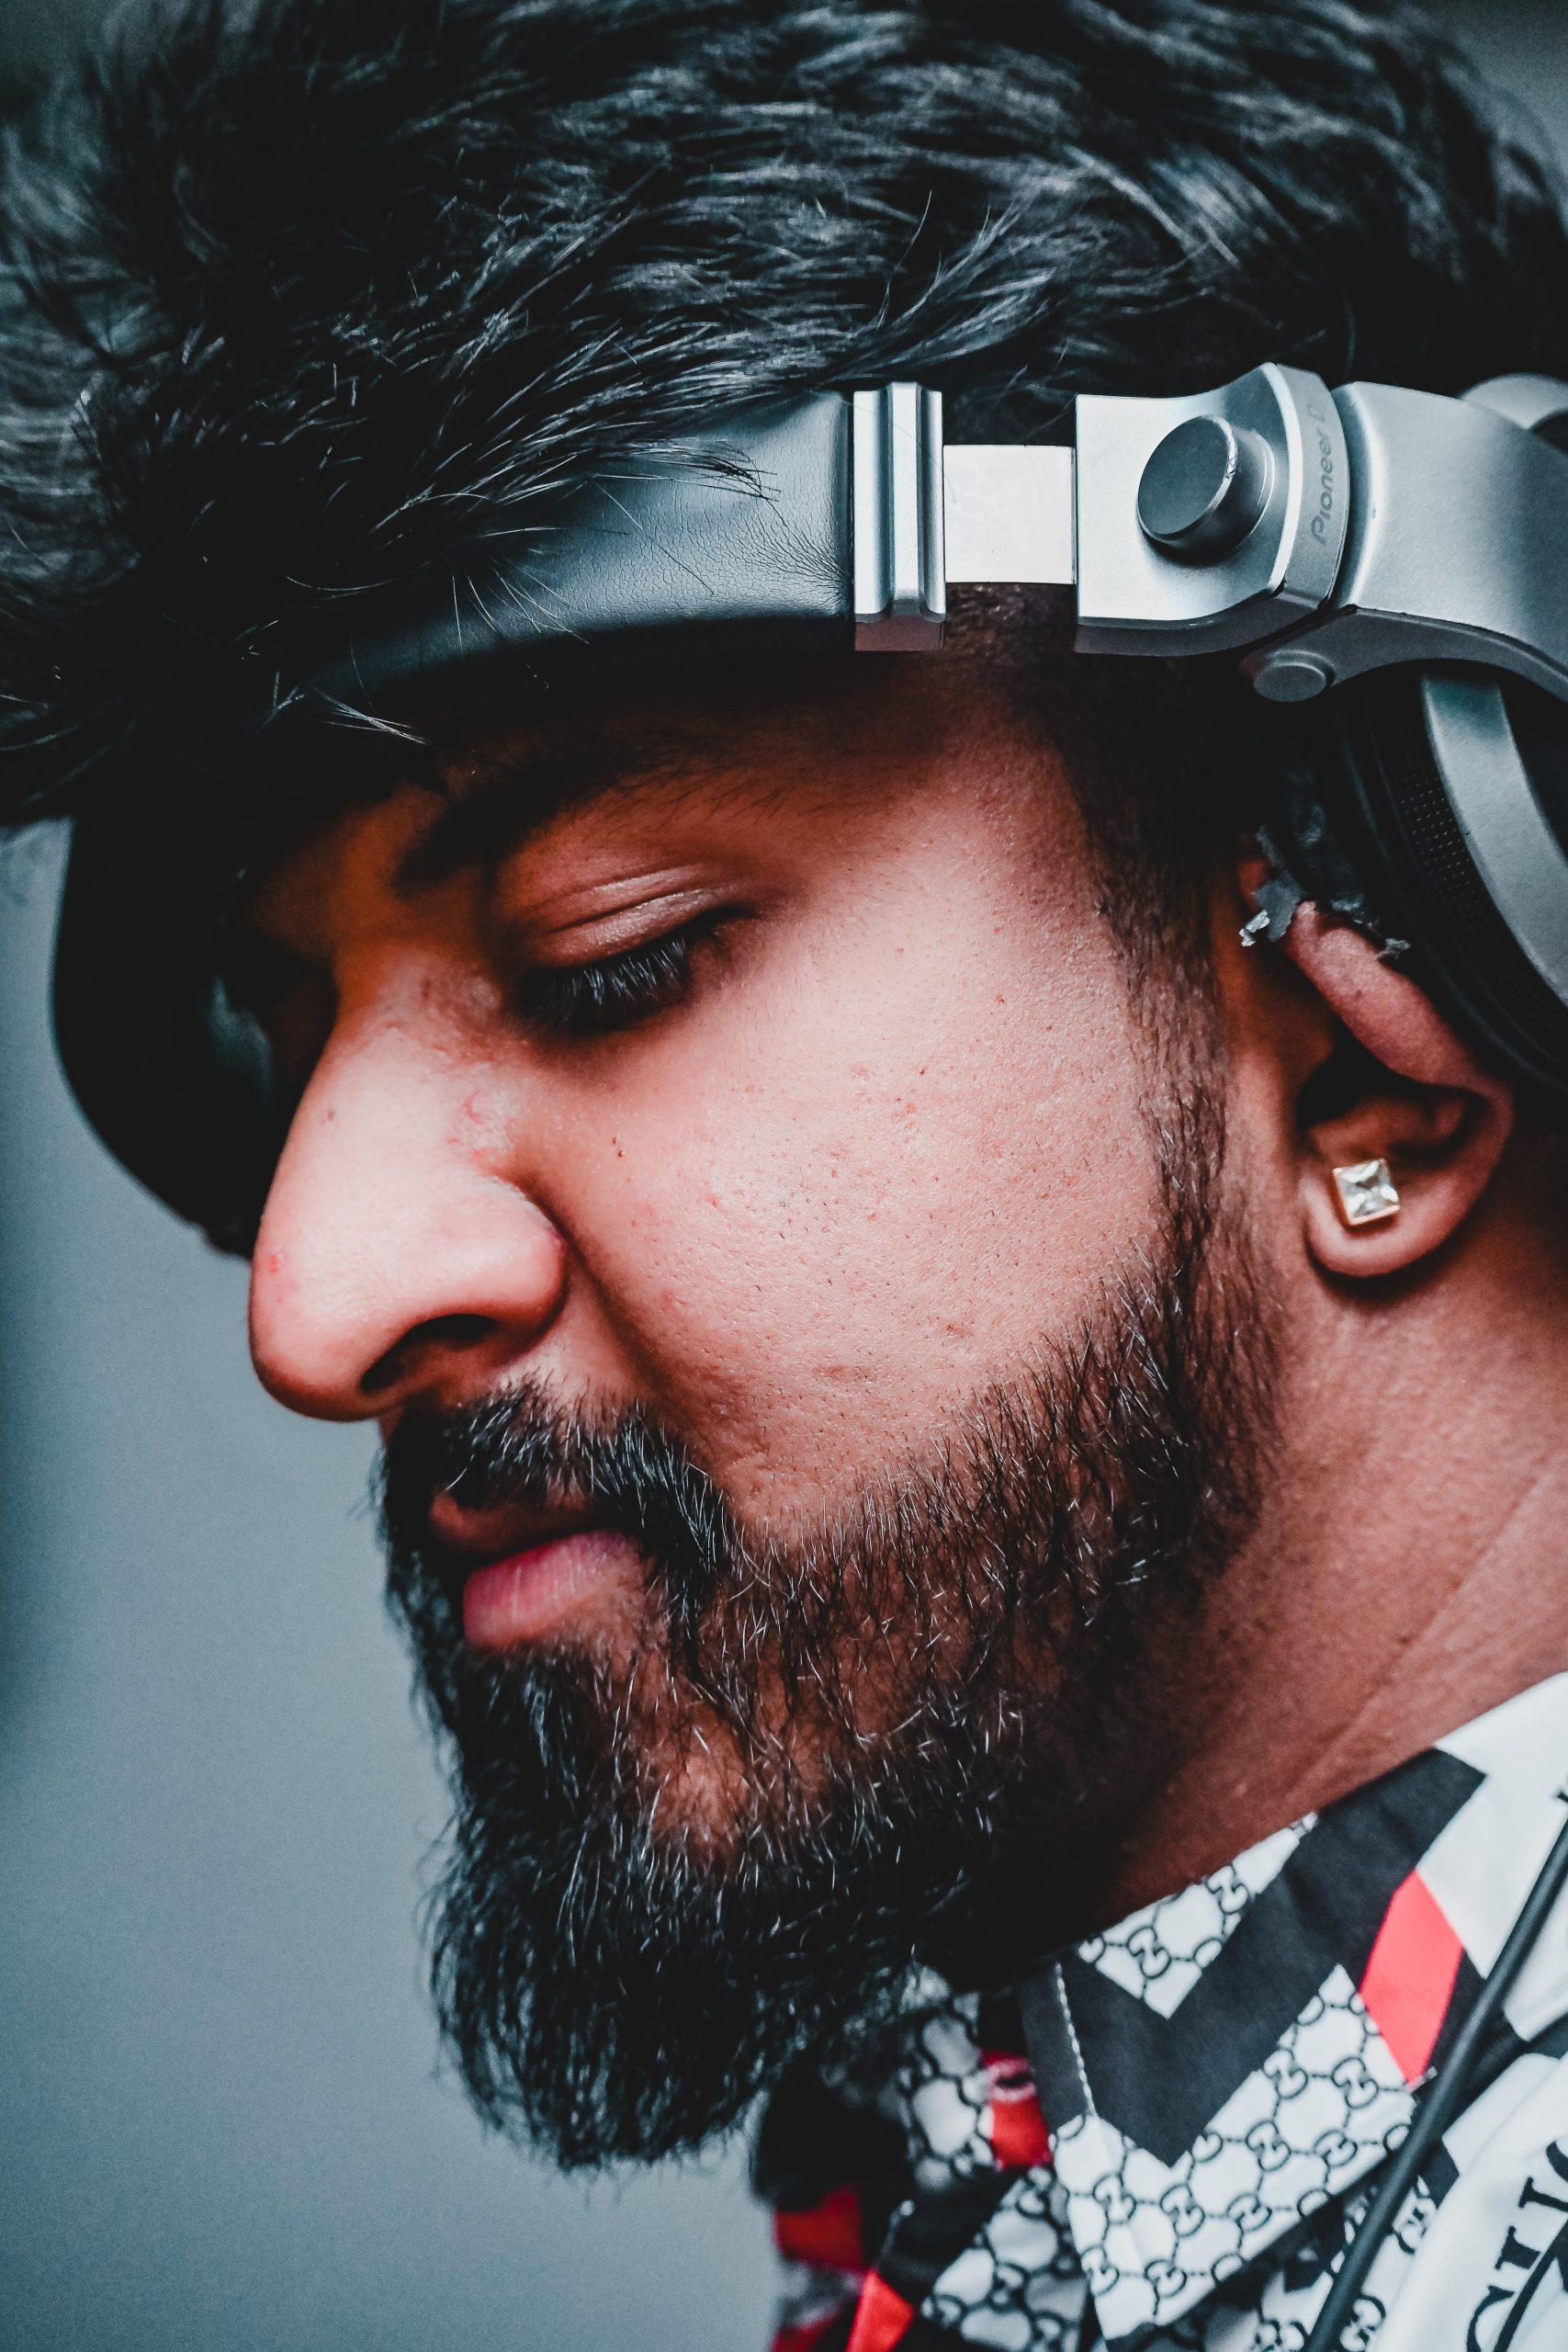 Stylish boy posing while wearing headphones